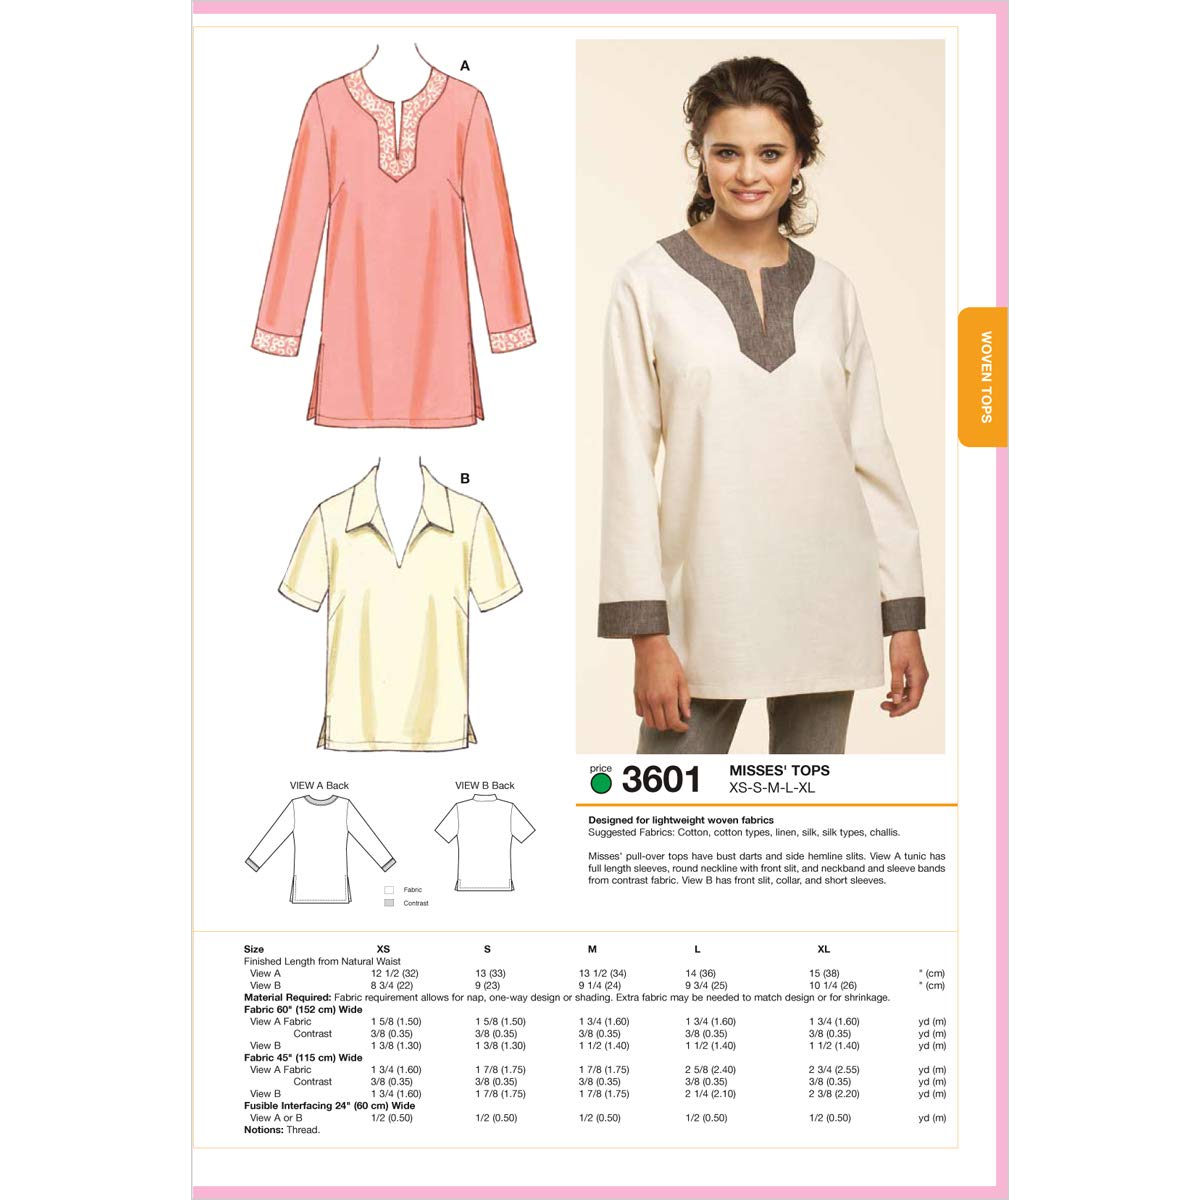 Amazon.com: Kwik Sew K3601 Pull-Over Tops Sewing Pattern, Size XS ...